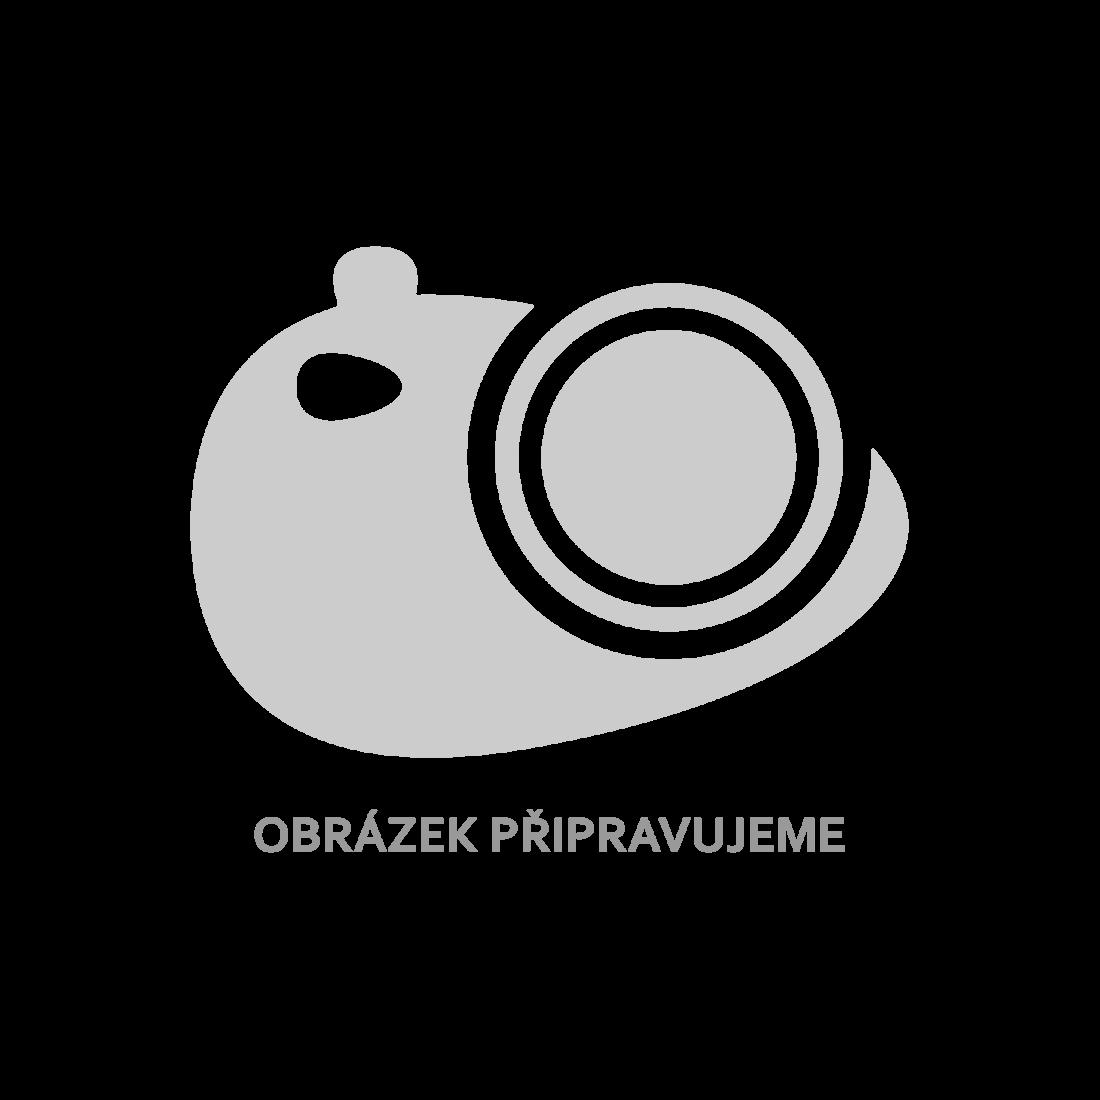 vidaXL Knihovna černá 60 x 35 x 180 cm dřevotříska [803426]